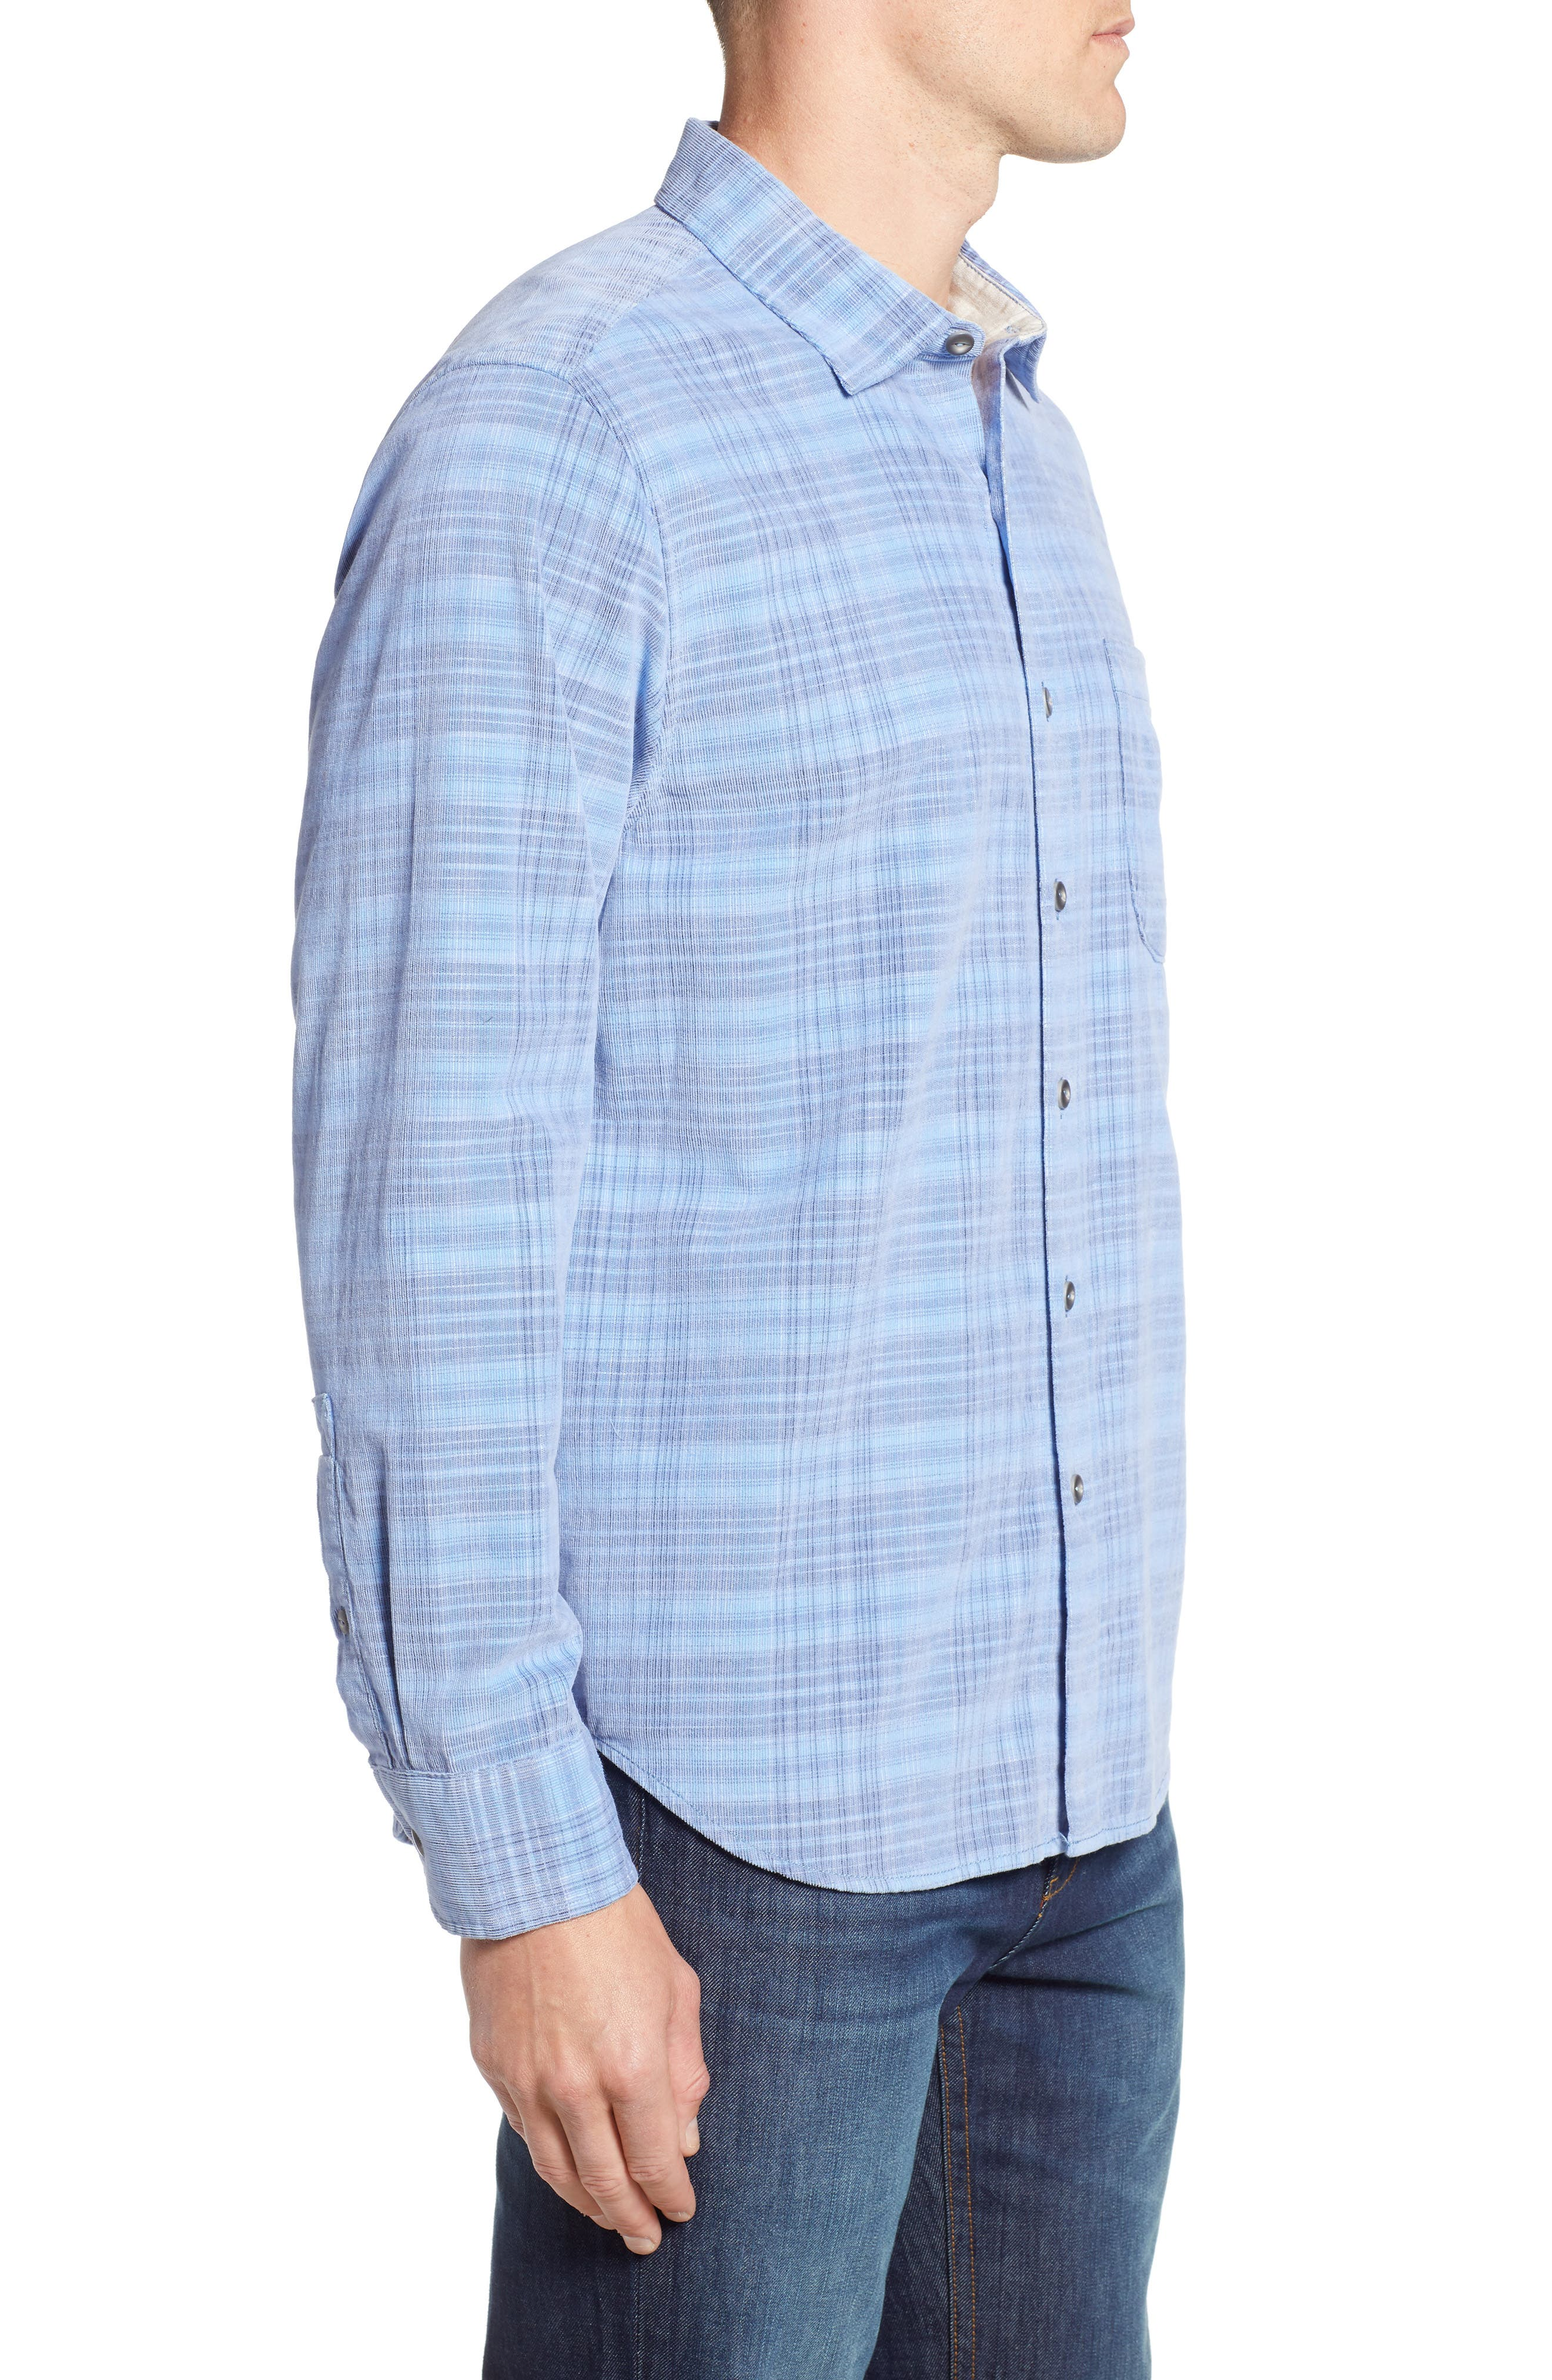 Cruzy Plaid Corduroy Sport Shirt,                             Alternate thumbnail 3, color,                             RIVIERA AZURE